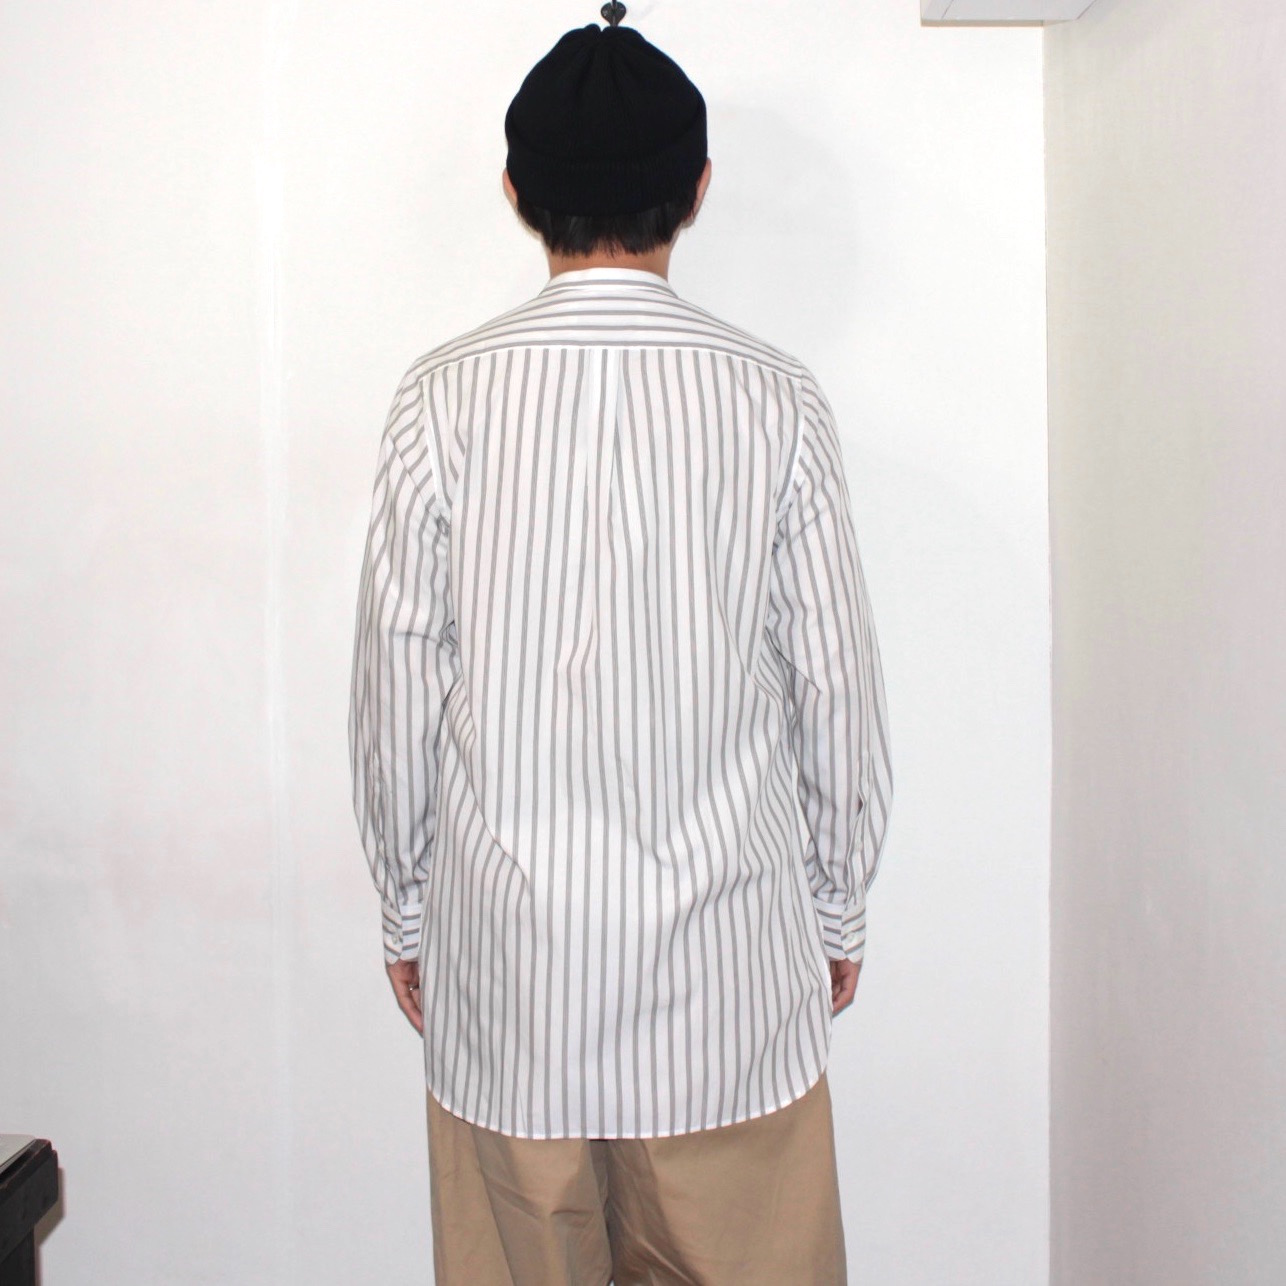 STUDIO NICHOLSON(スタジオニコルソン) | STAND COLLAR PATCH POKET SHIRT(カブリラシャツ) -KHAKI STRIPE